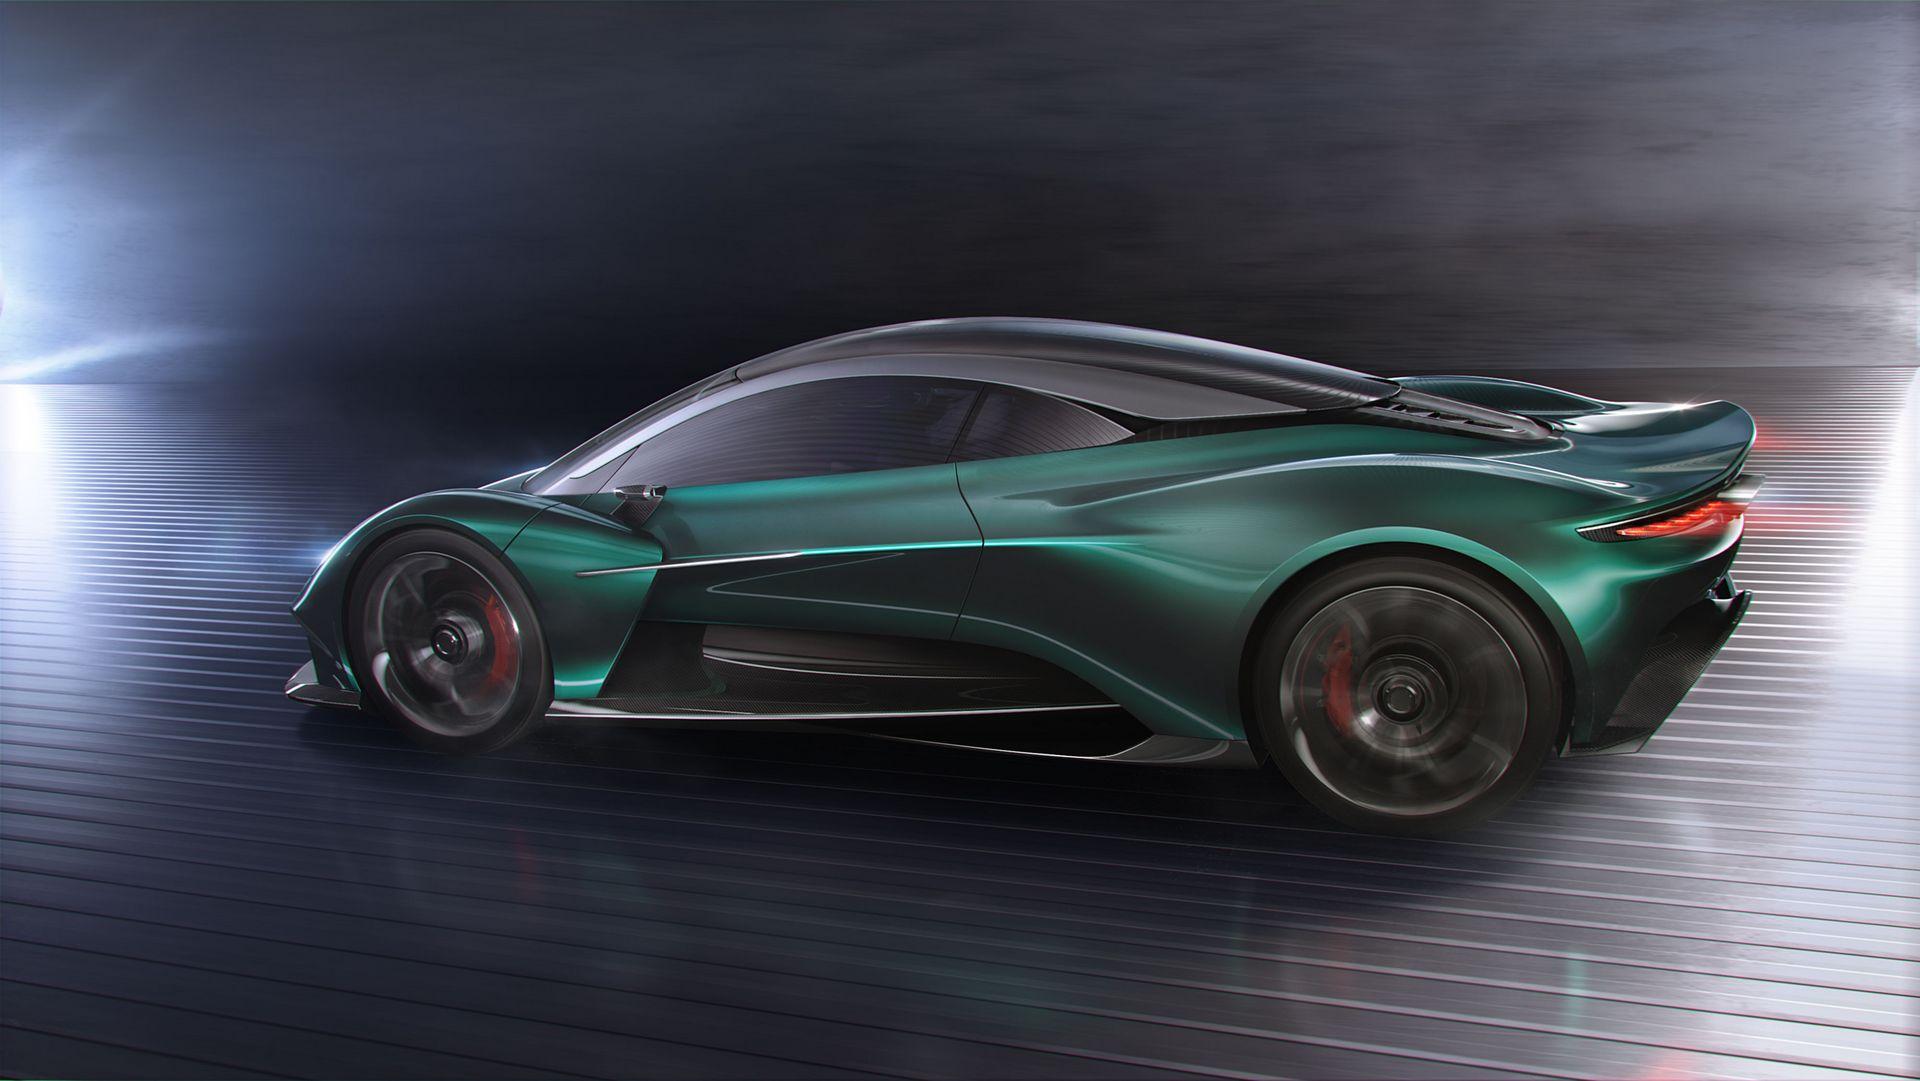 Aston Martin Vanquish Vision Concept (7)